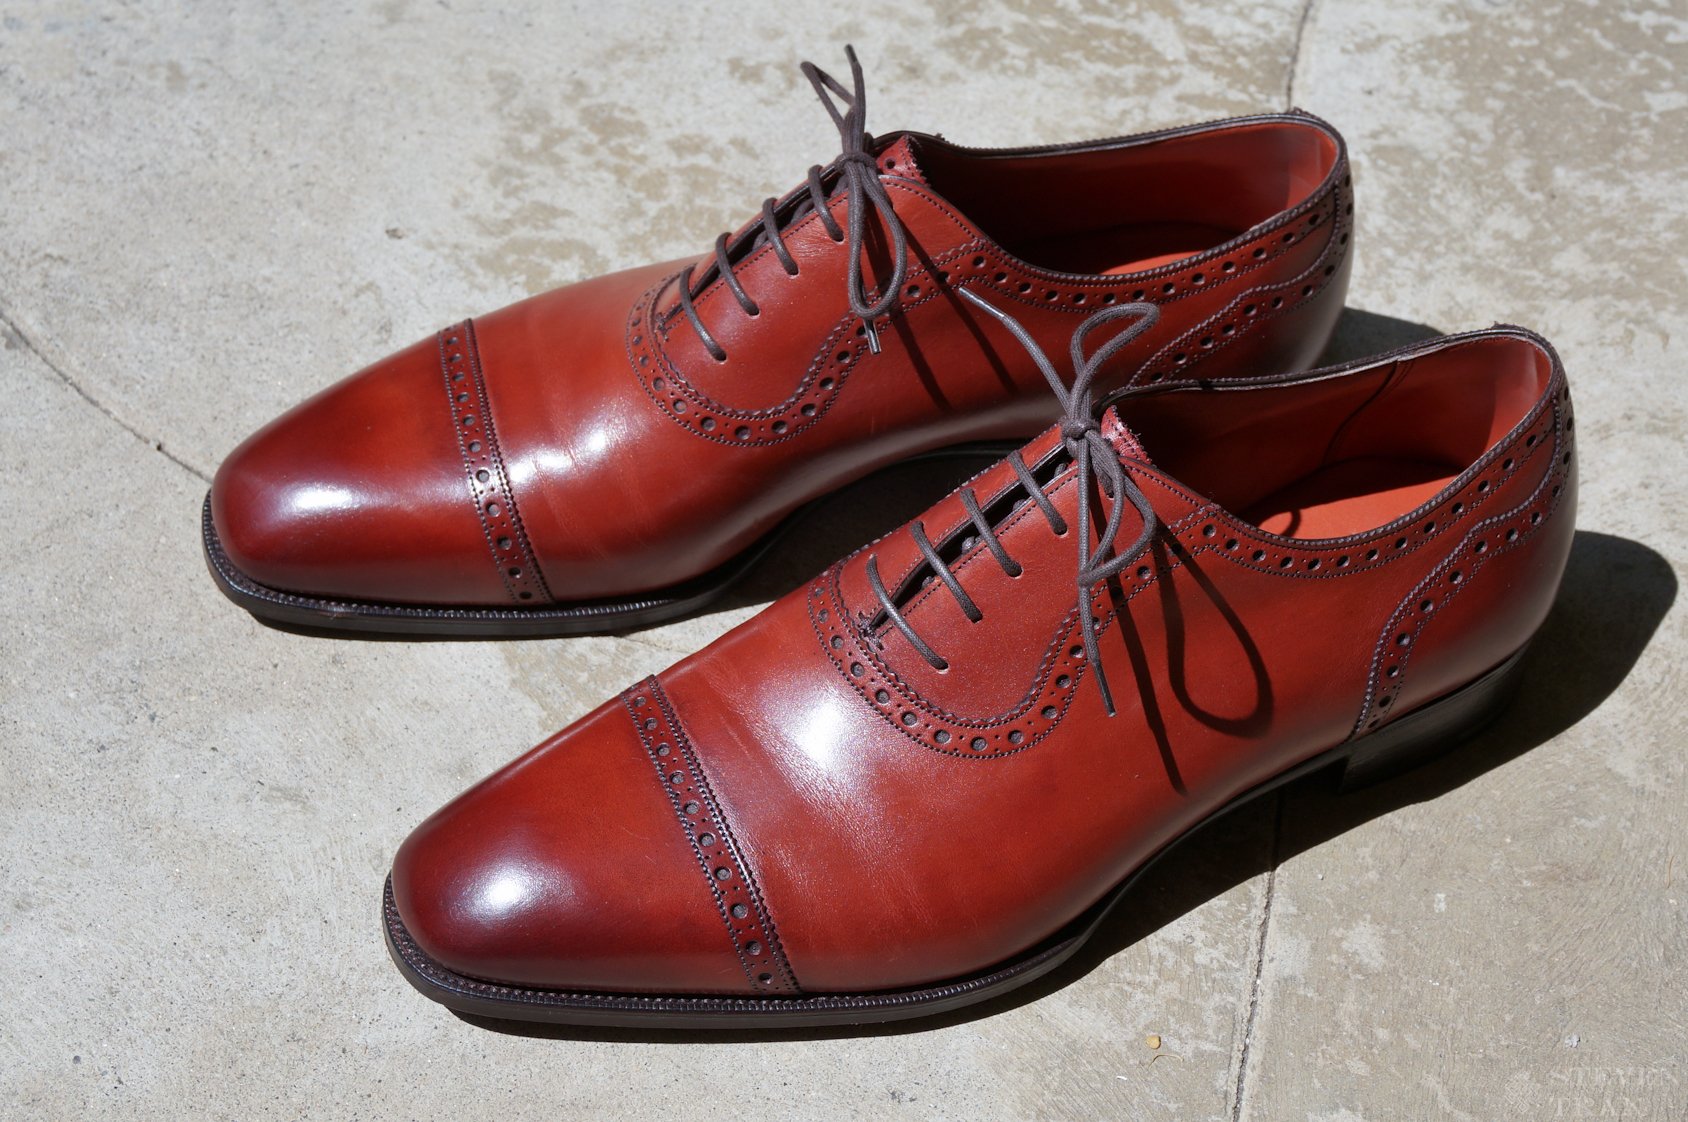 Styleforum Best Value Shoes